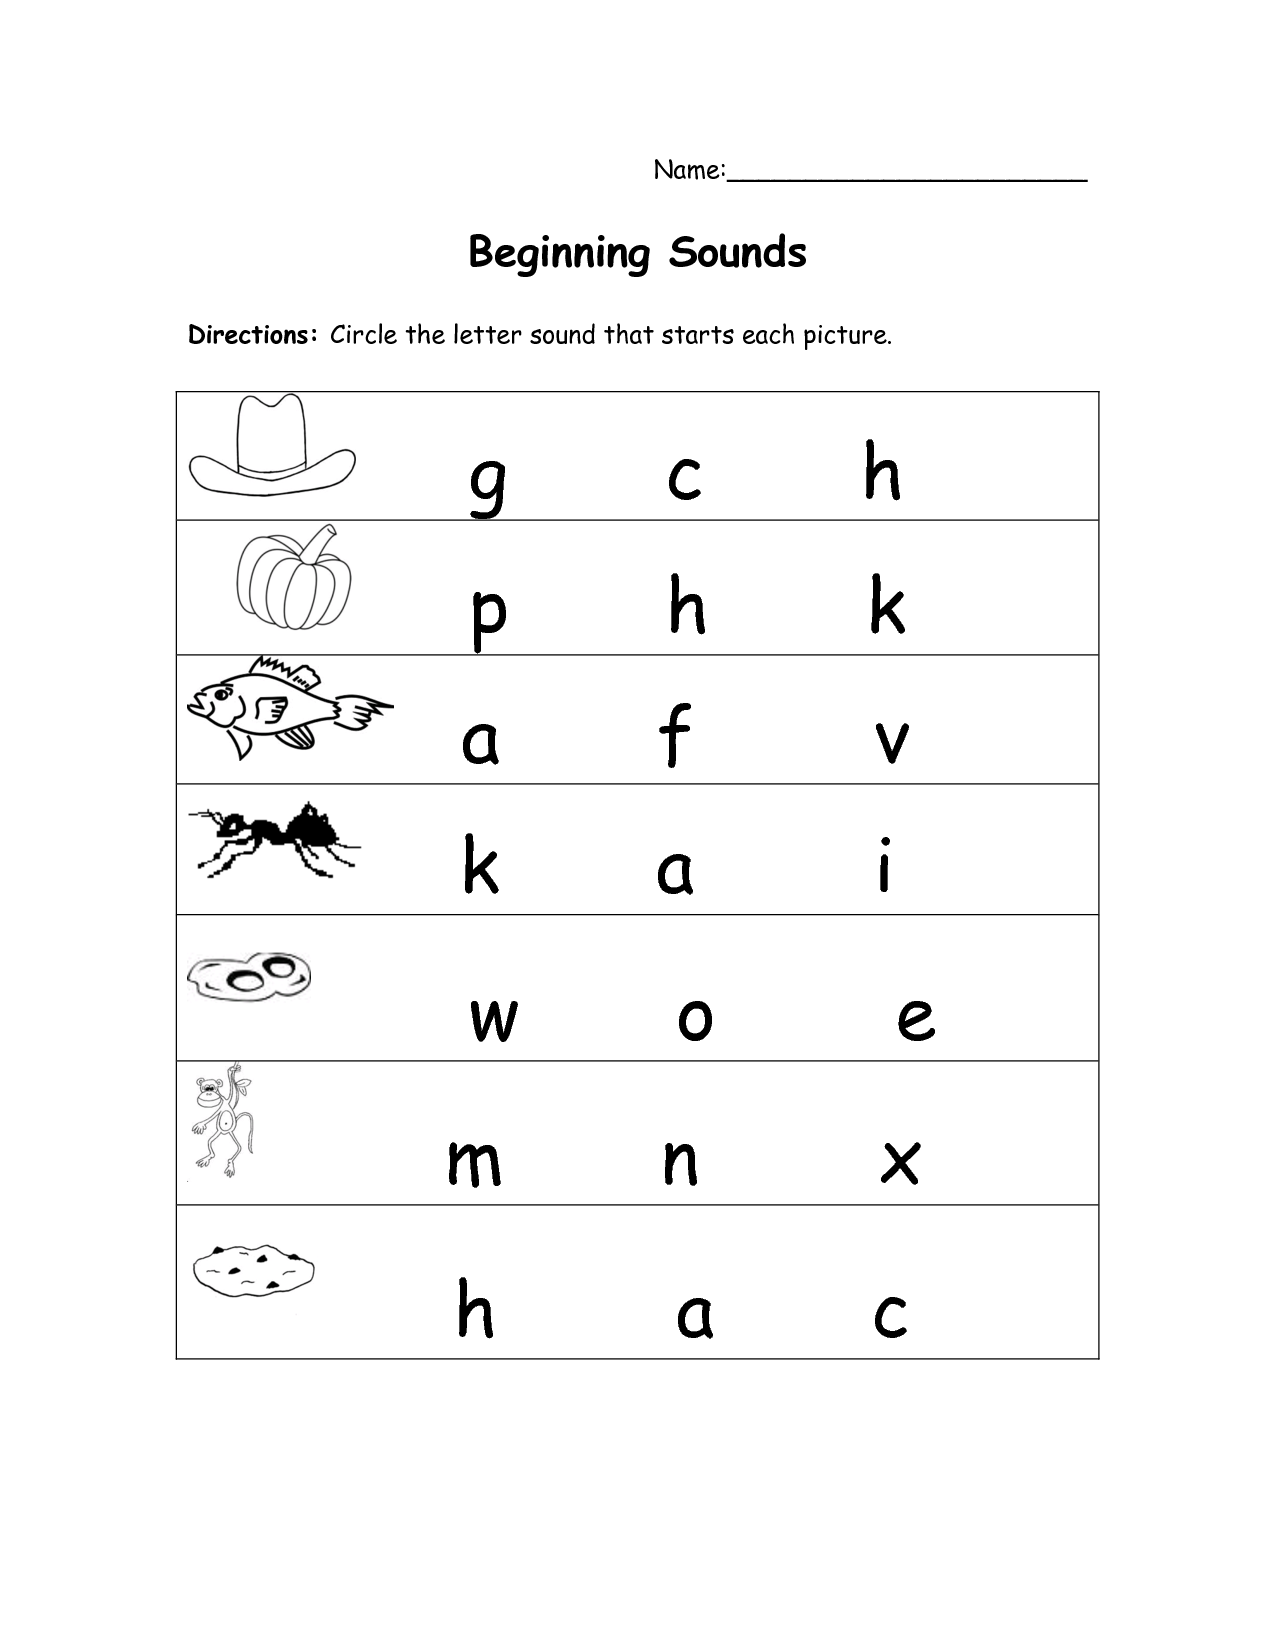 worksheet Letter Sound Worksheets For Pre K beginning letter sound activities danasokc top abc pinterest preschool